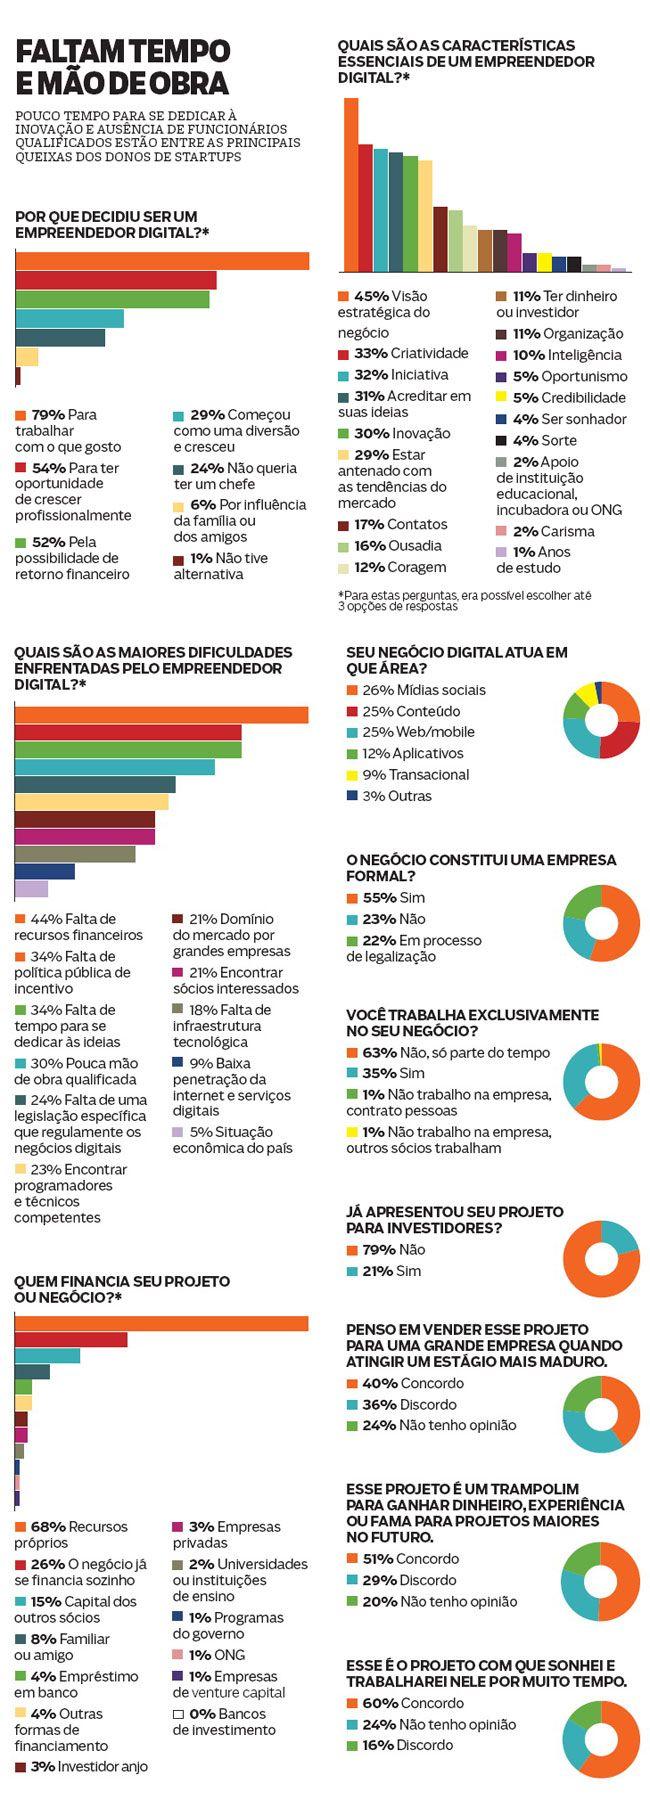 Brazilian Digital Entrepreneur